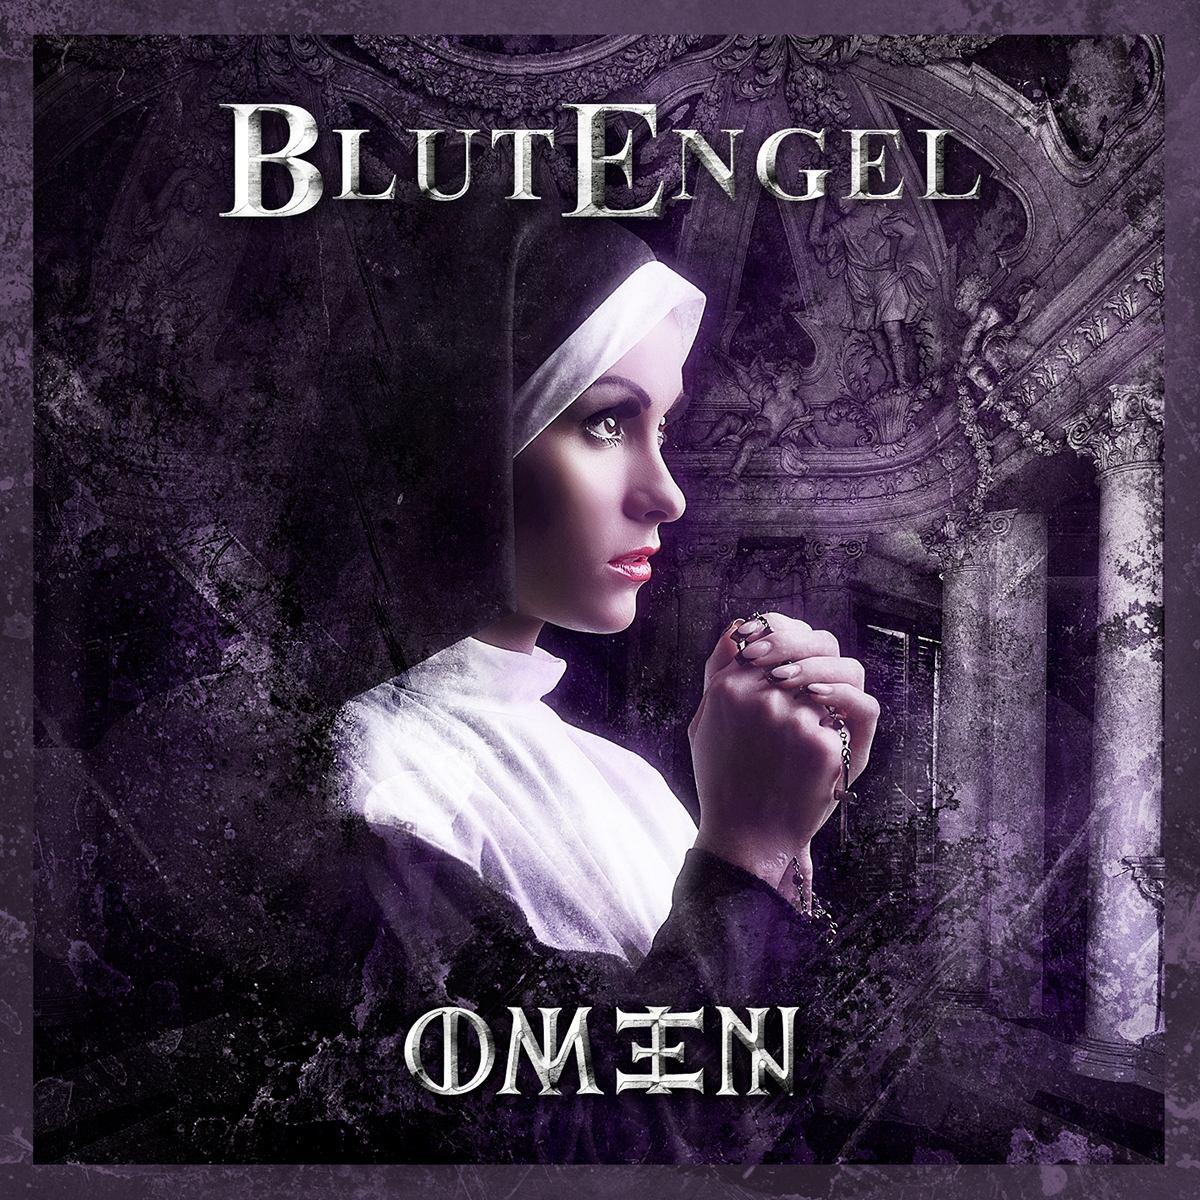 Blutengel: Omen (2015) Book Cover